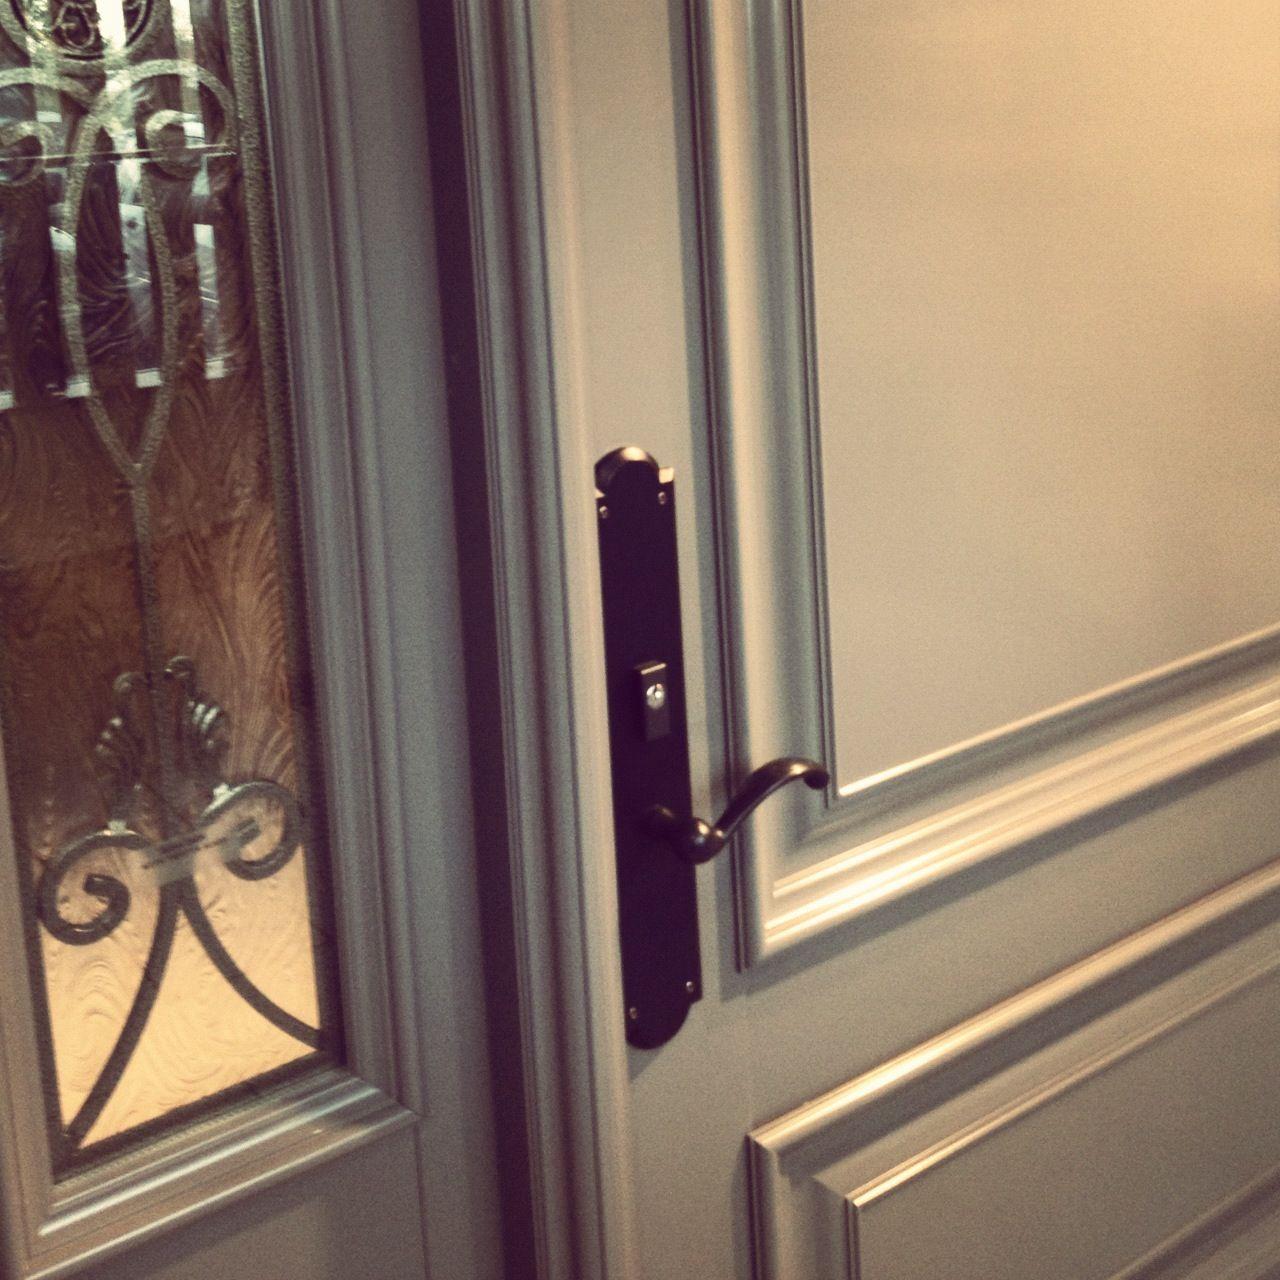 1280 #A18C2A Fiberglass Door Bravo Windows And Doors Pinterest image Fiberglass Doors 41431280